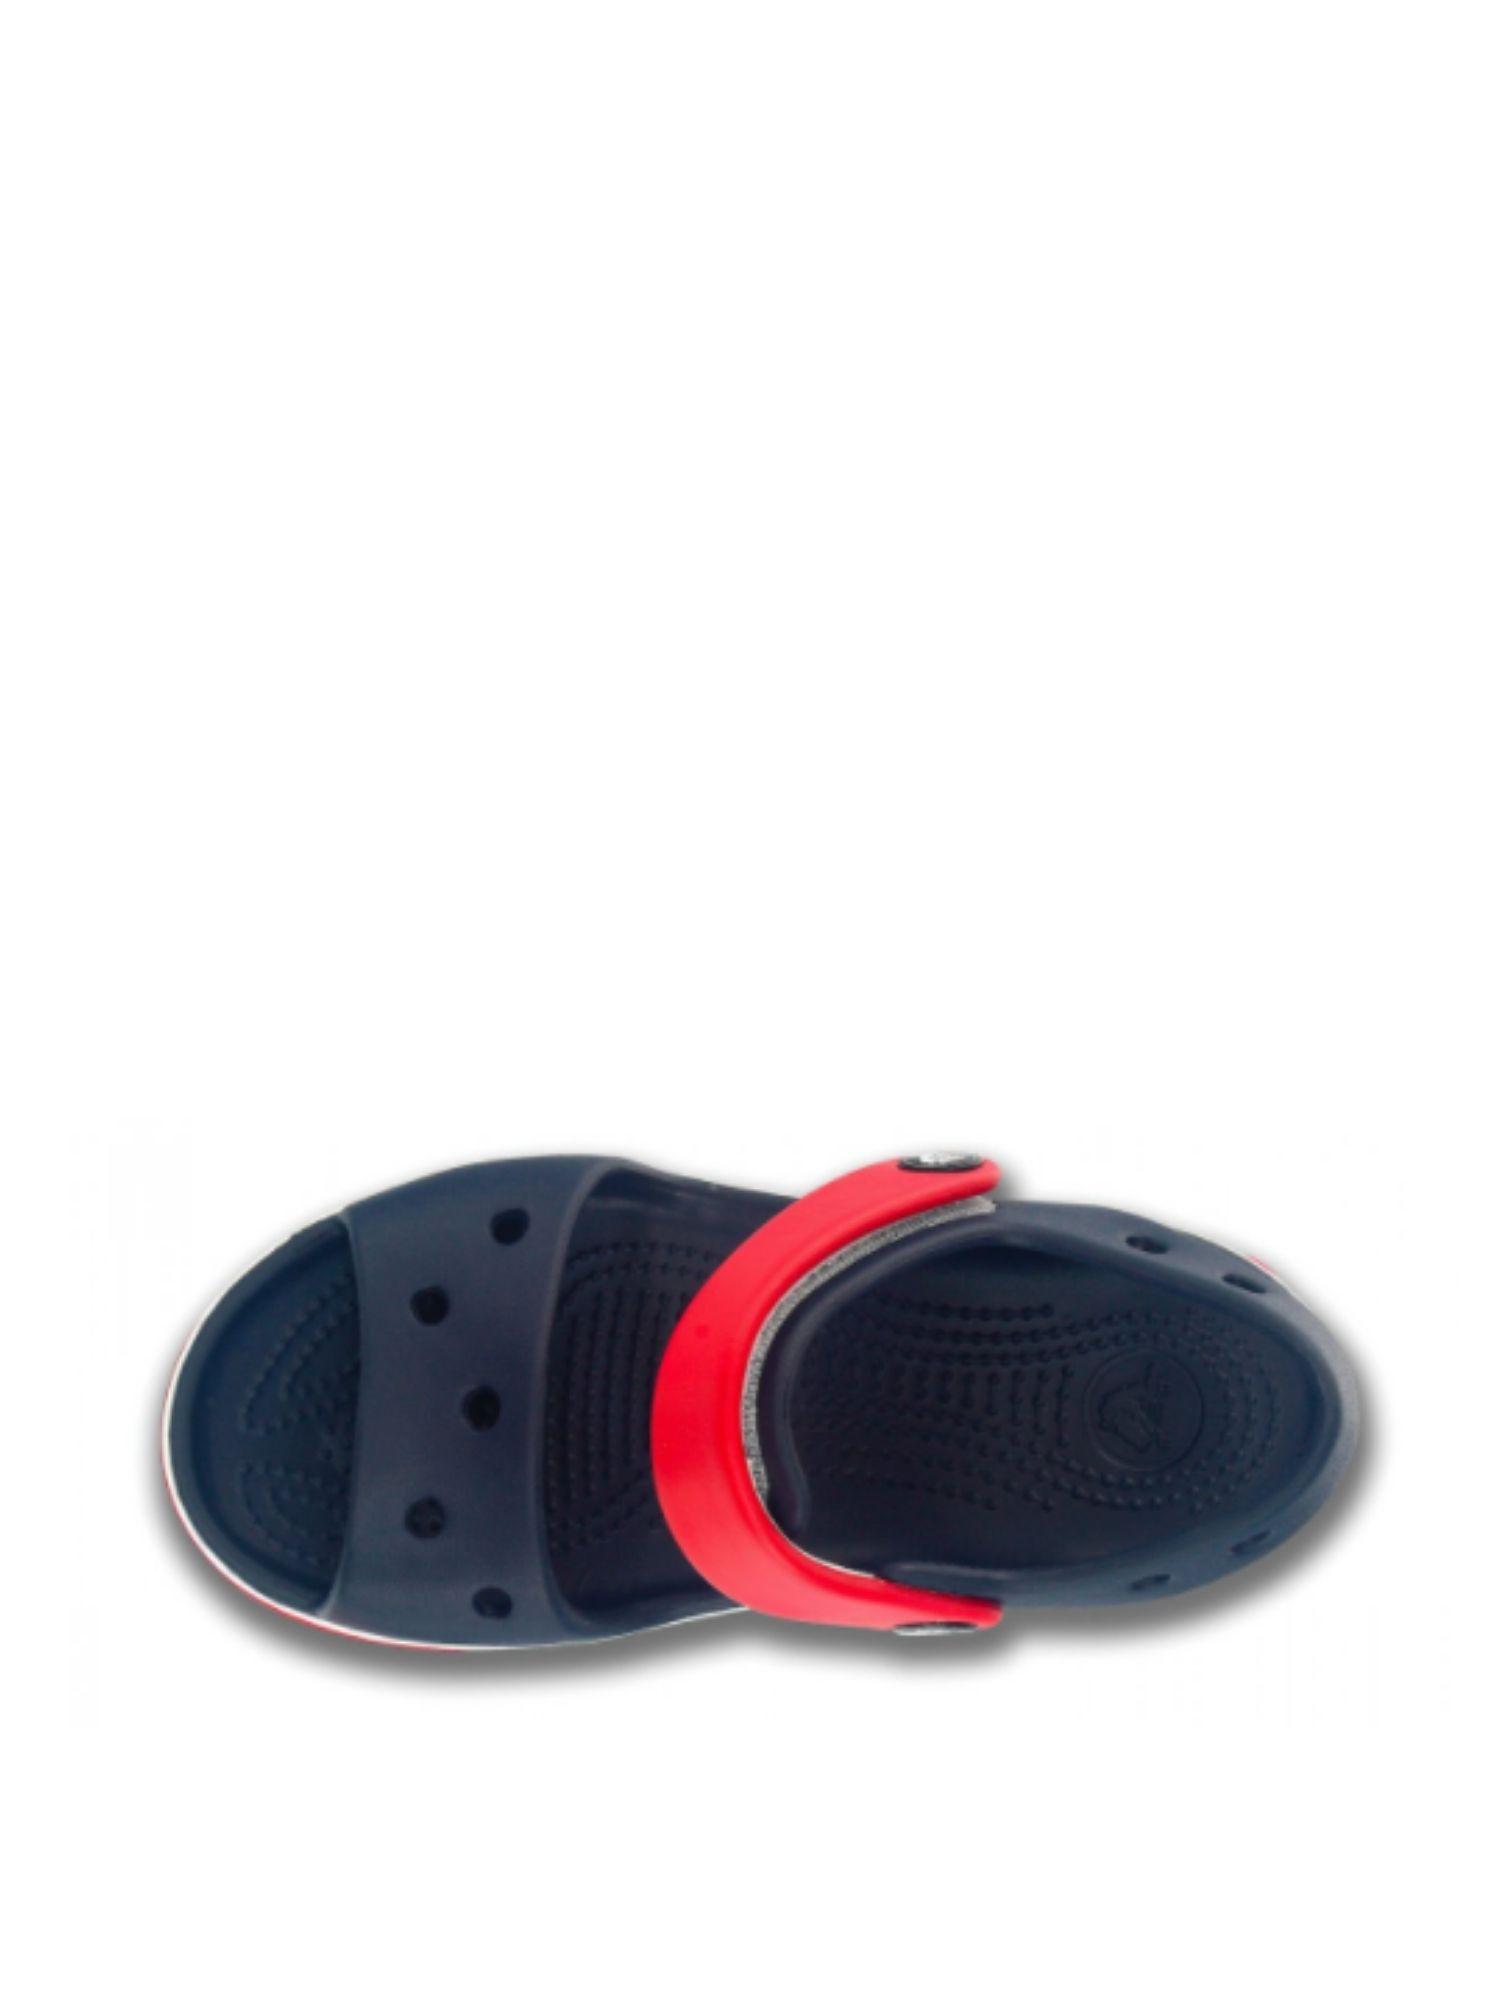 Sandalo Crocs bambino Crocband Sandalo K 12856 NavyRed alto